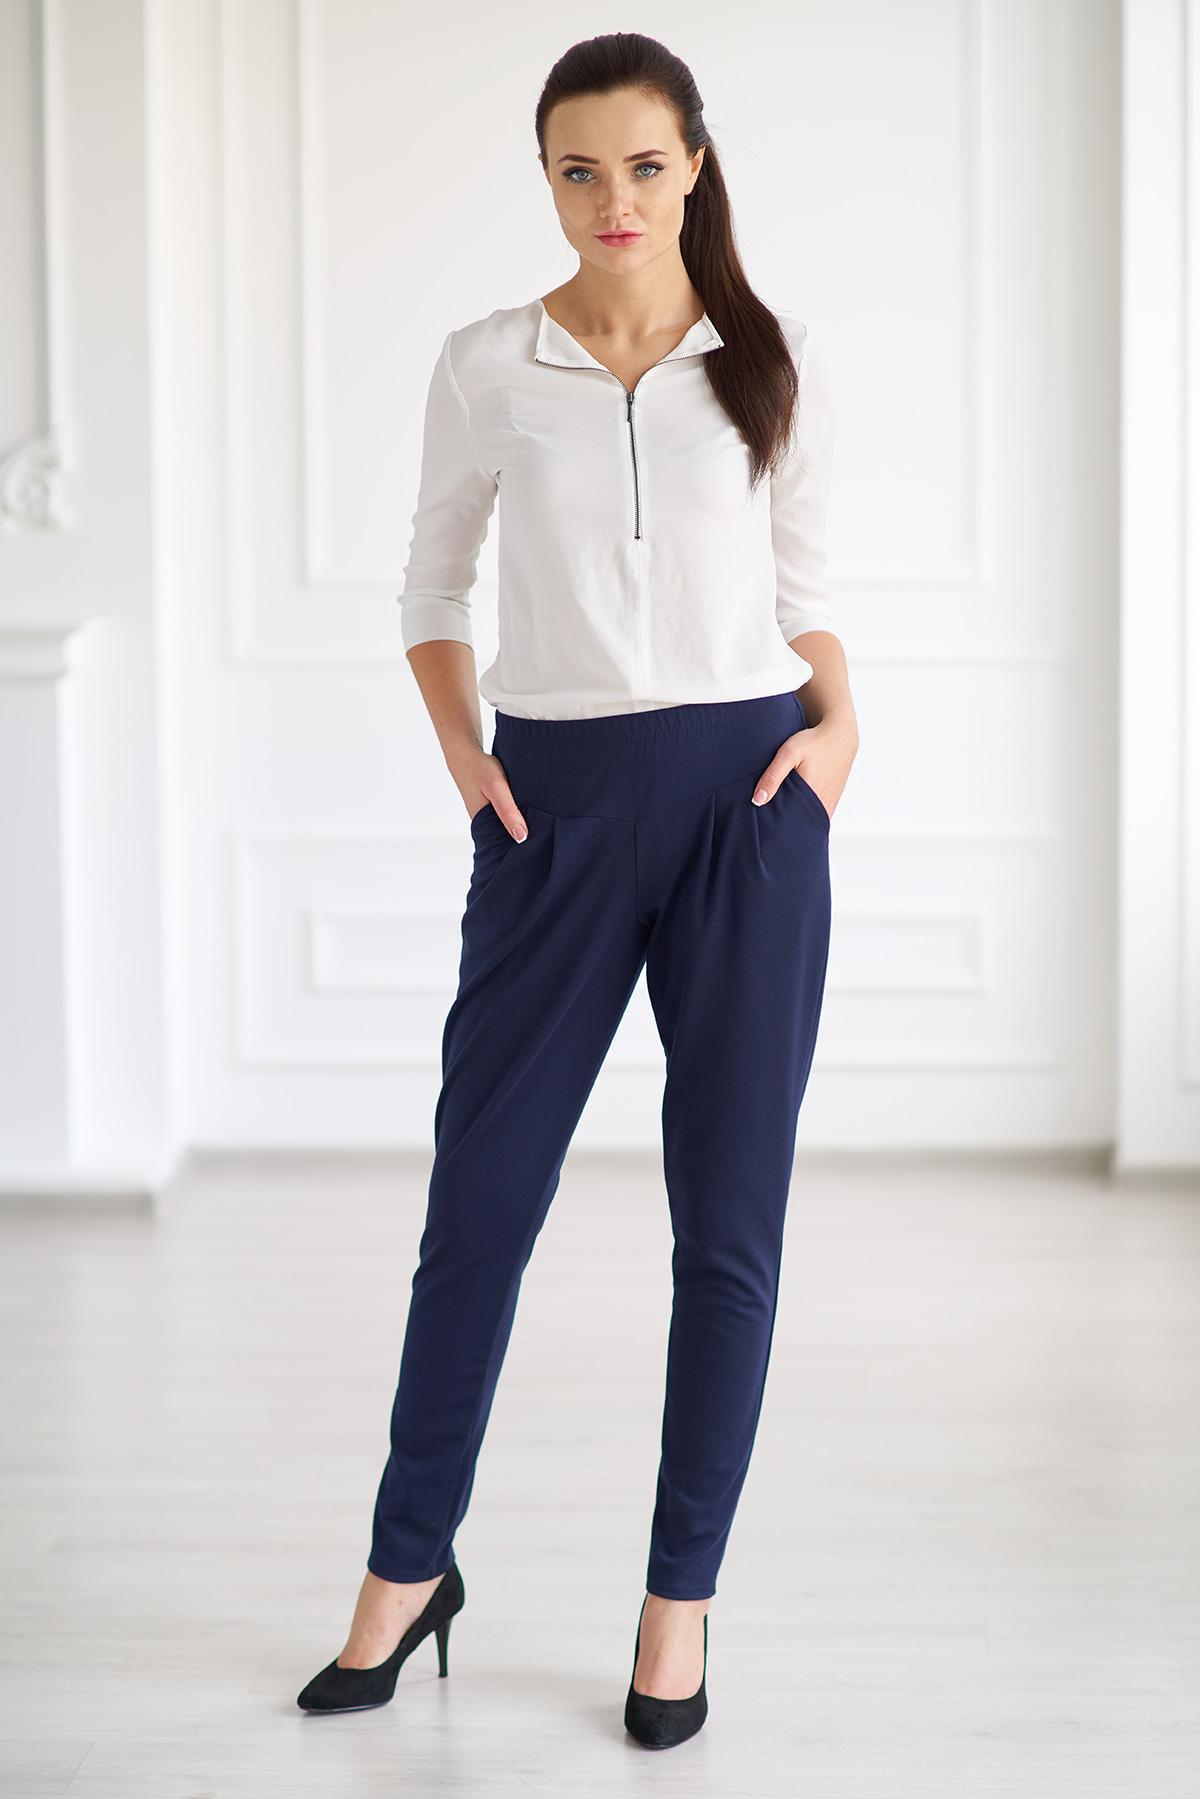 Жен. брюки арт. 19-0004 Темно-синий р. 48Брюки<br>Факт. ОТ: 72 см <br>Факт. ОБ: 100 см <br>Высота посадки брюк: 26 см <br>Длина брючин по внут. шву: 78 см<br><br>Тип: Жен. брюки<br>Размер: 48<br>Материал: Милано